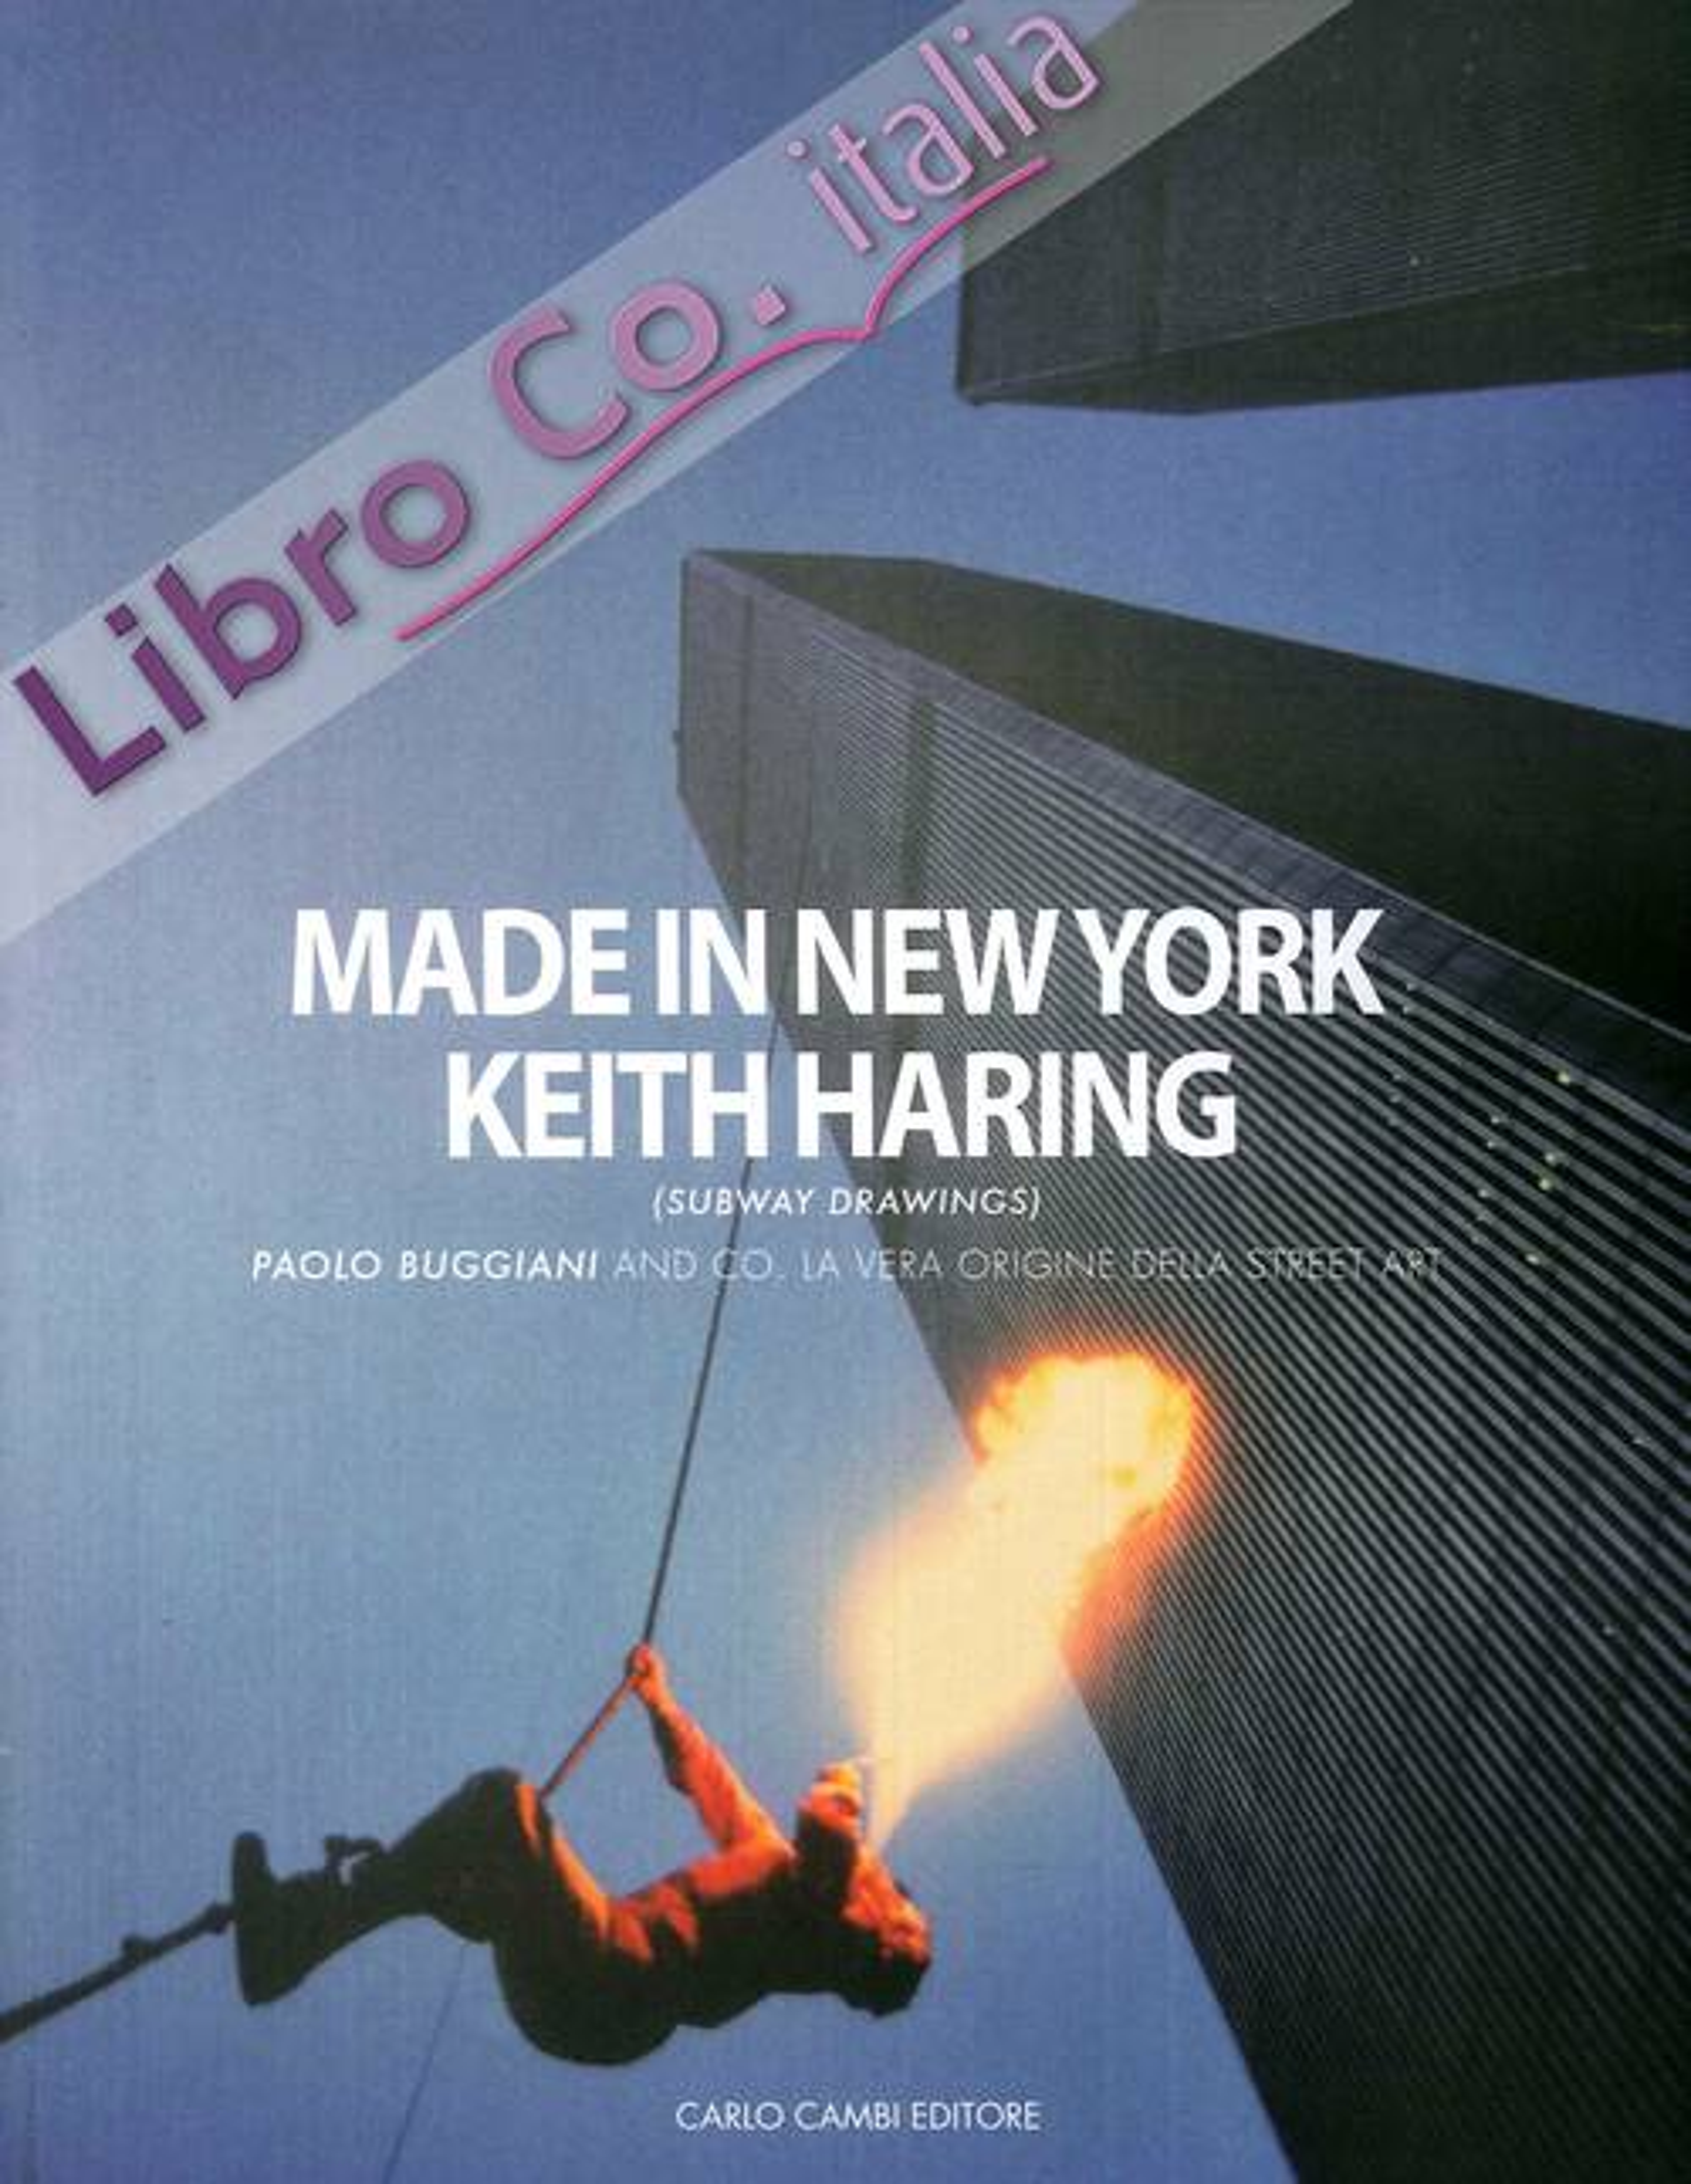 Made in New York. Keith Haring (Subway Drawings), Paolo Buggiani and Co. La vera origine della Street Art